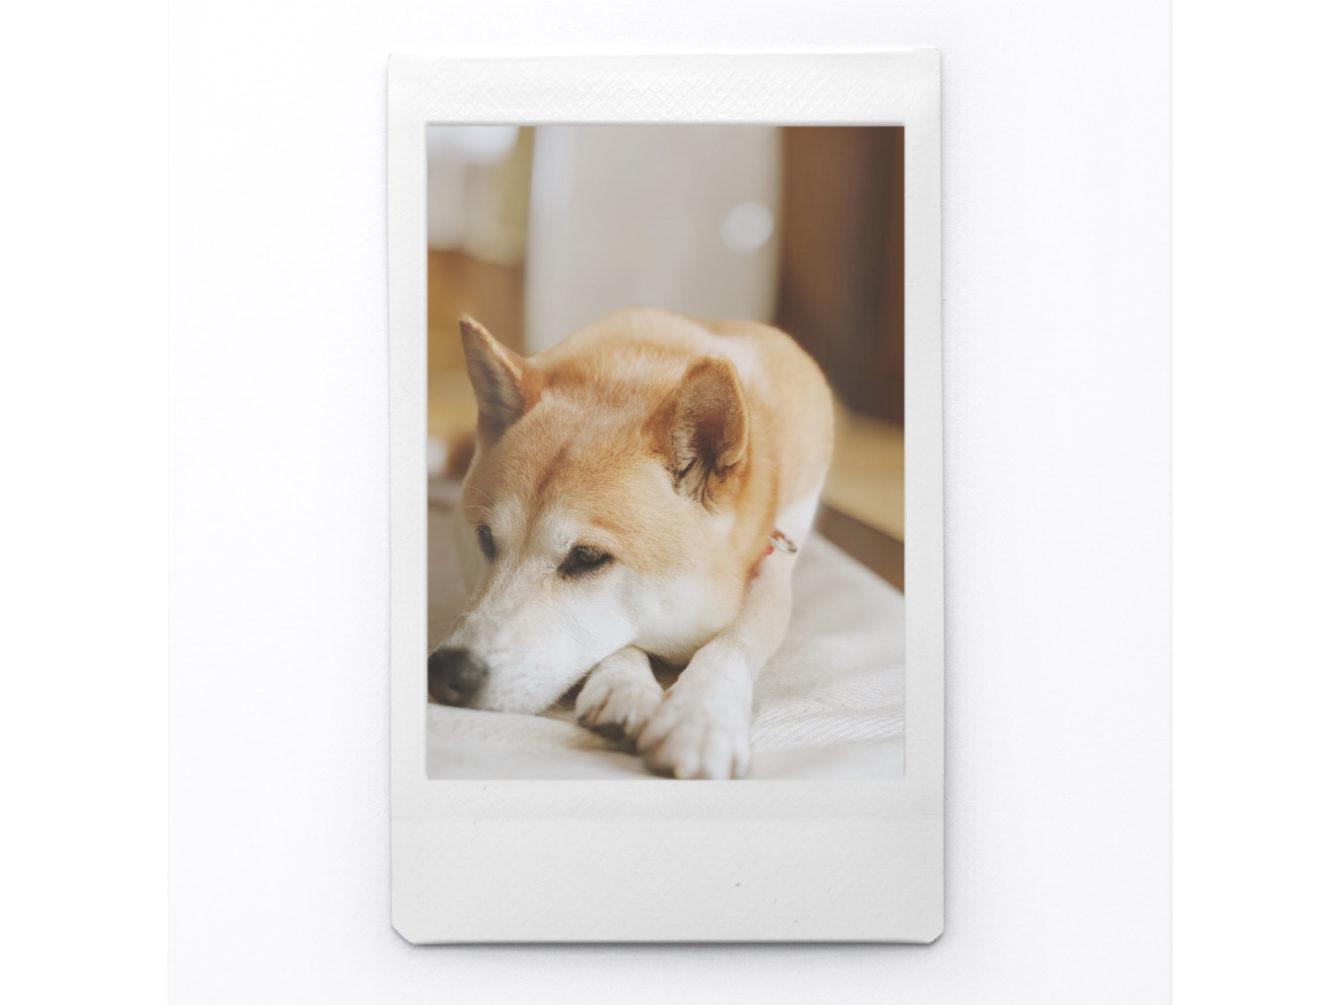 Instants - Instant Photo Maker